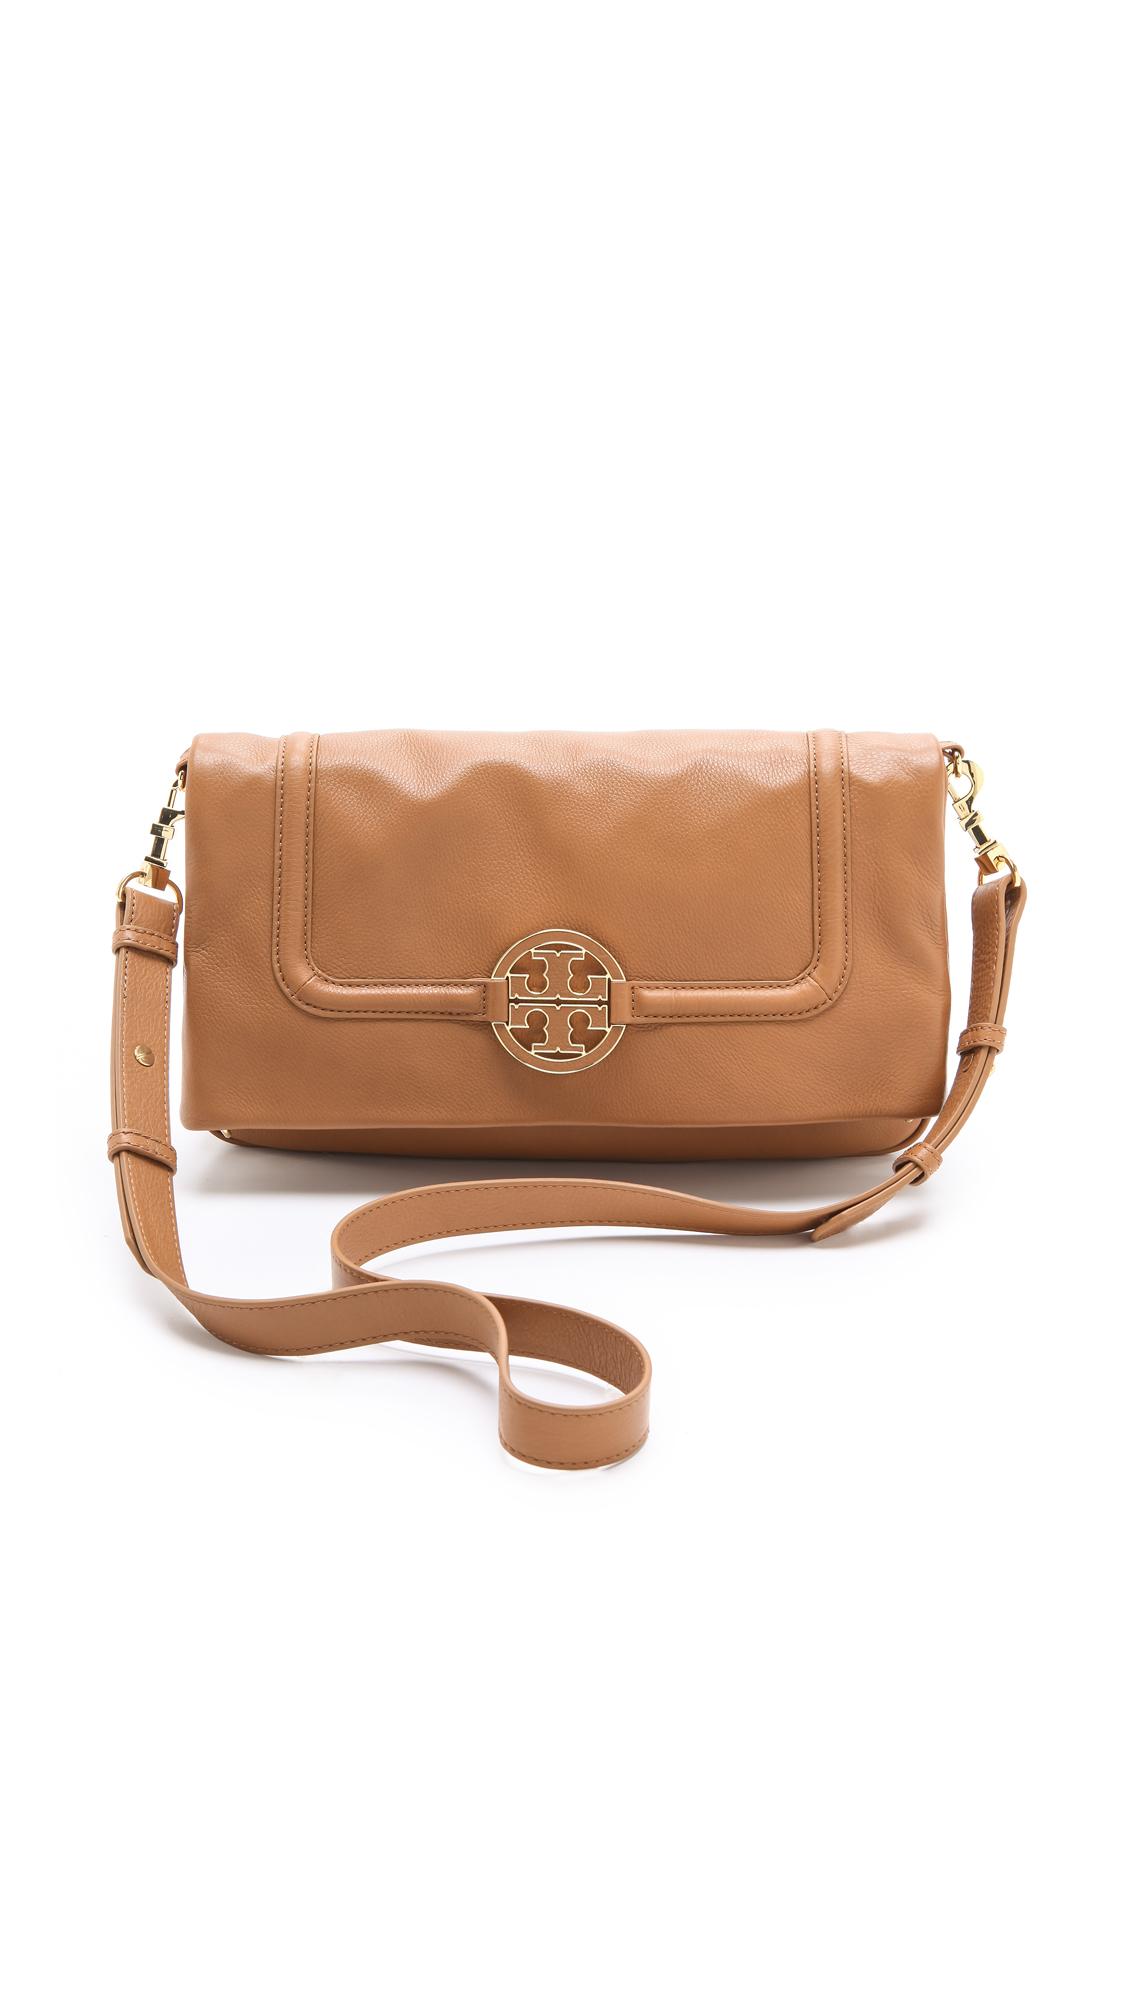 760c376b83f843 Tory Burch Amanda Fold Over Messenger Bag